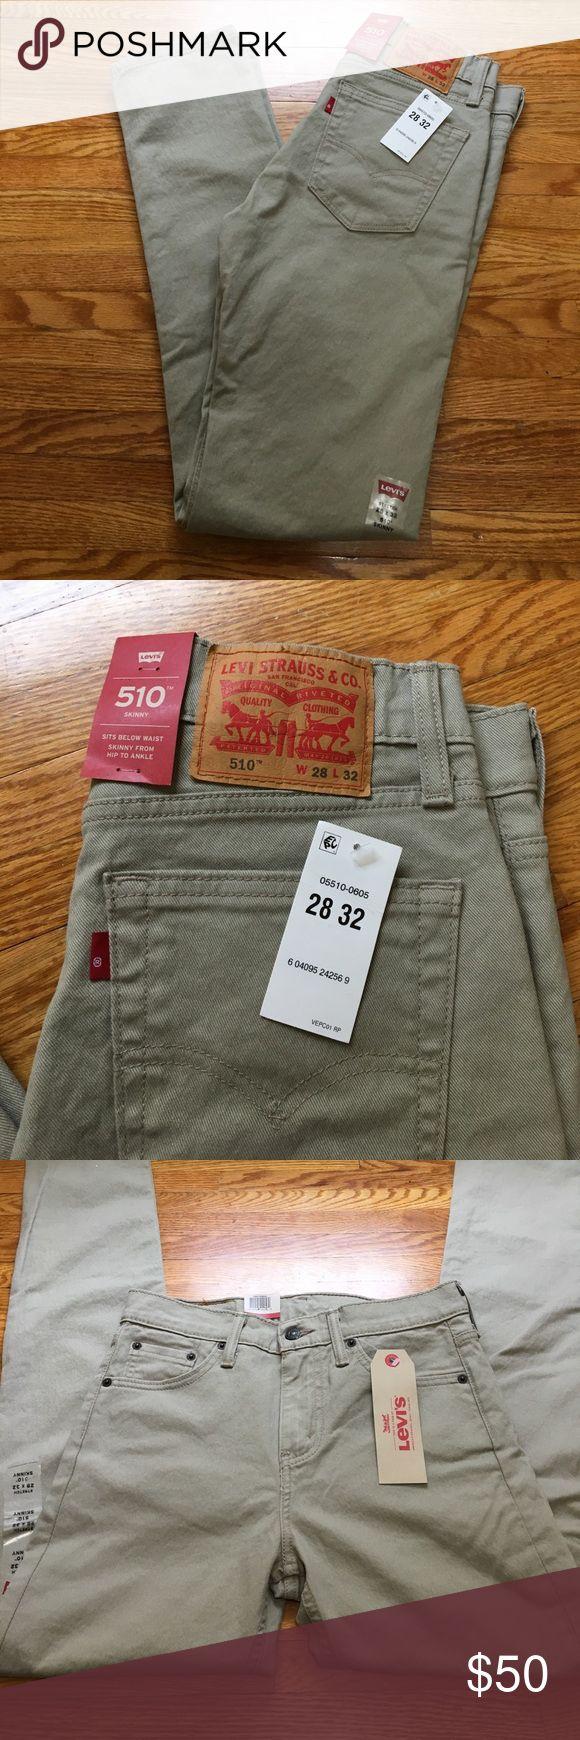 NWT Men's Levi's 510 Skinny Stretch Jeans New with tags Levi's Khaki skinny jeans with stretch material. 28x32. Levi's Jeans Skinny